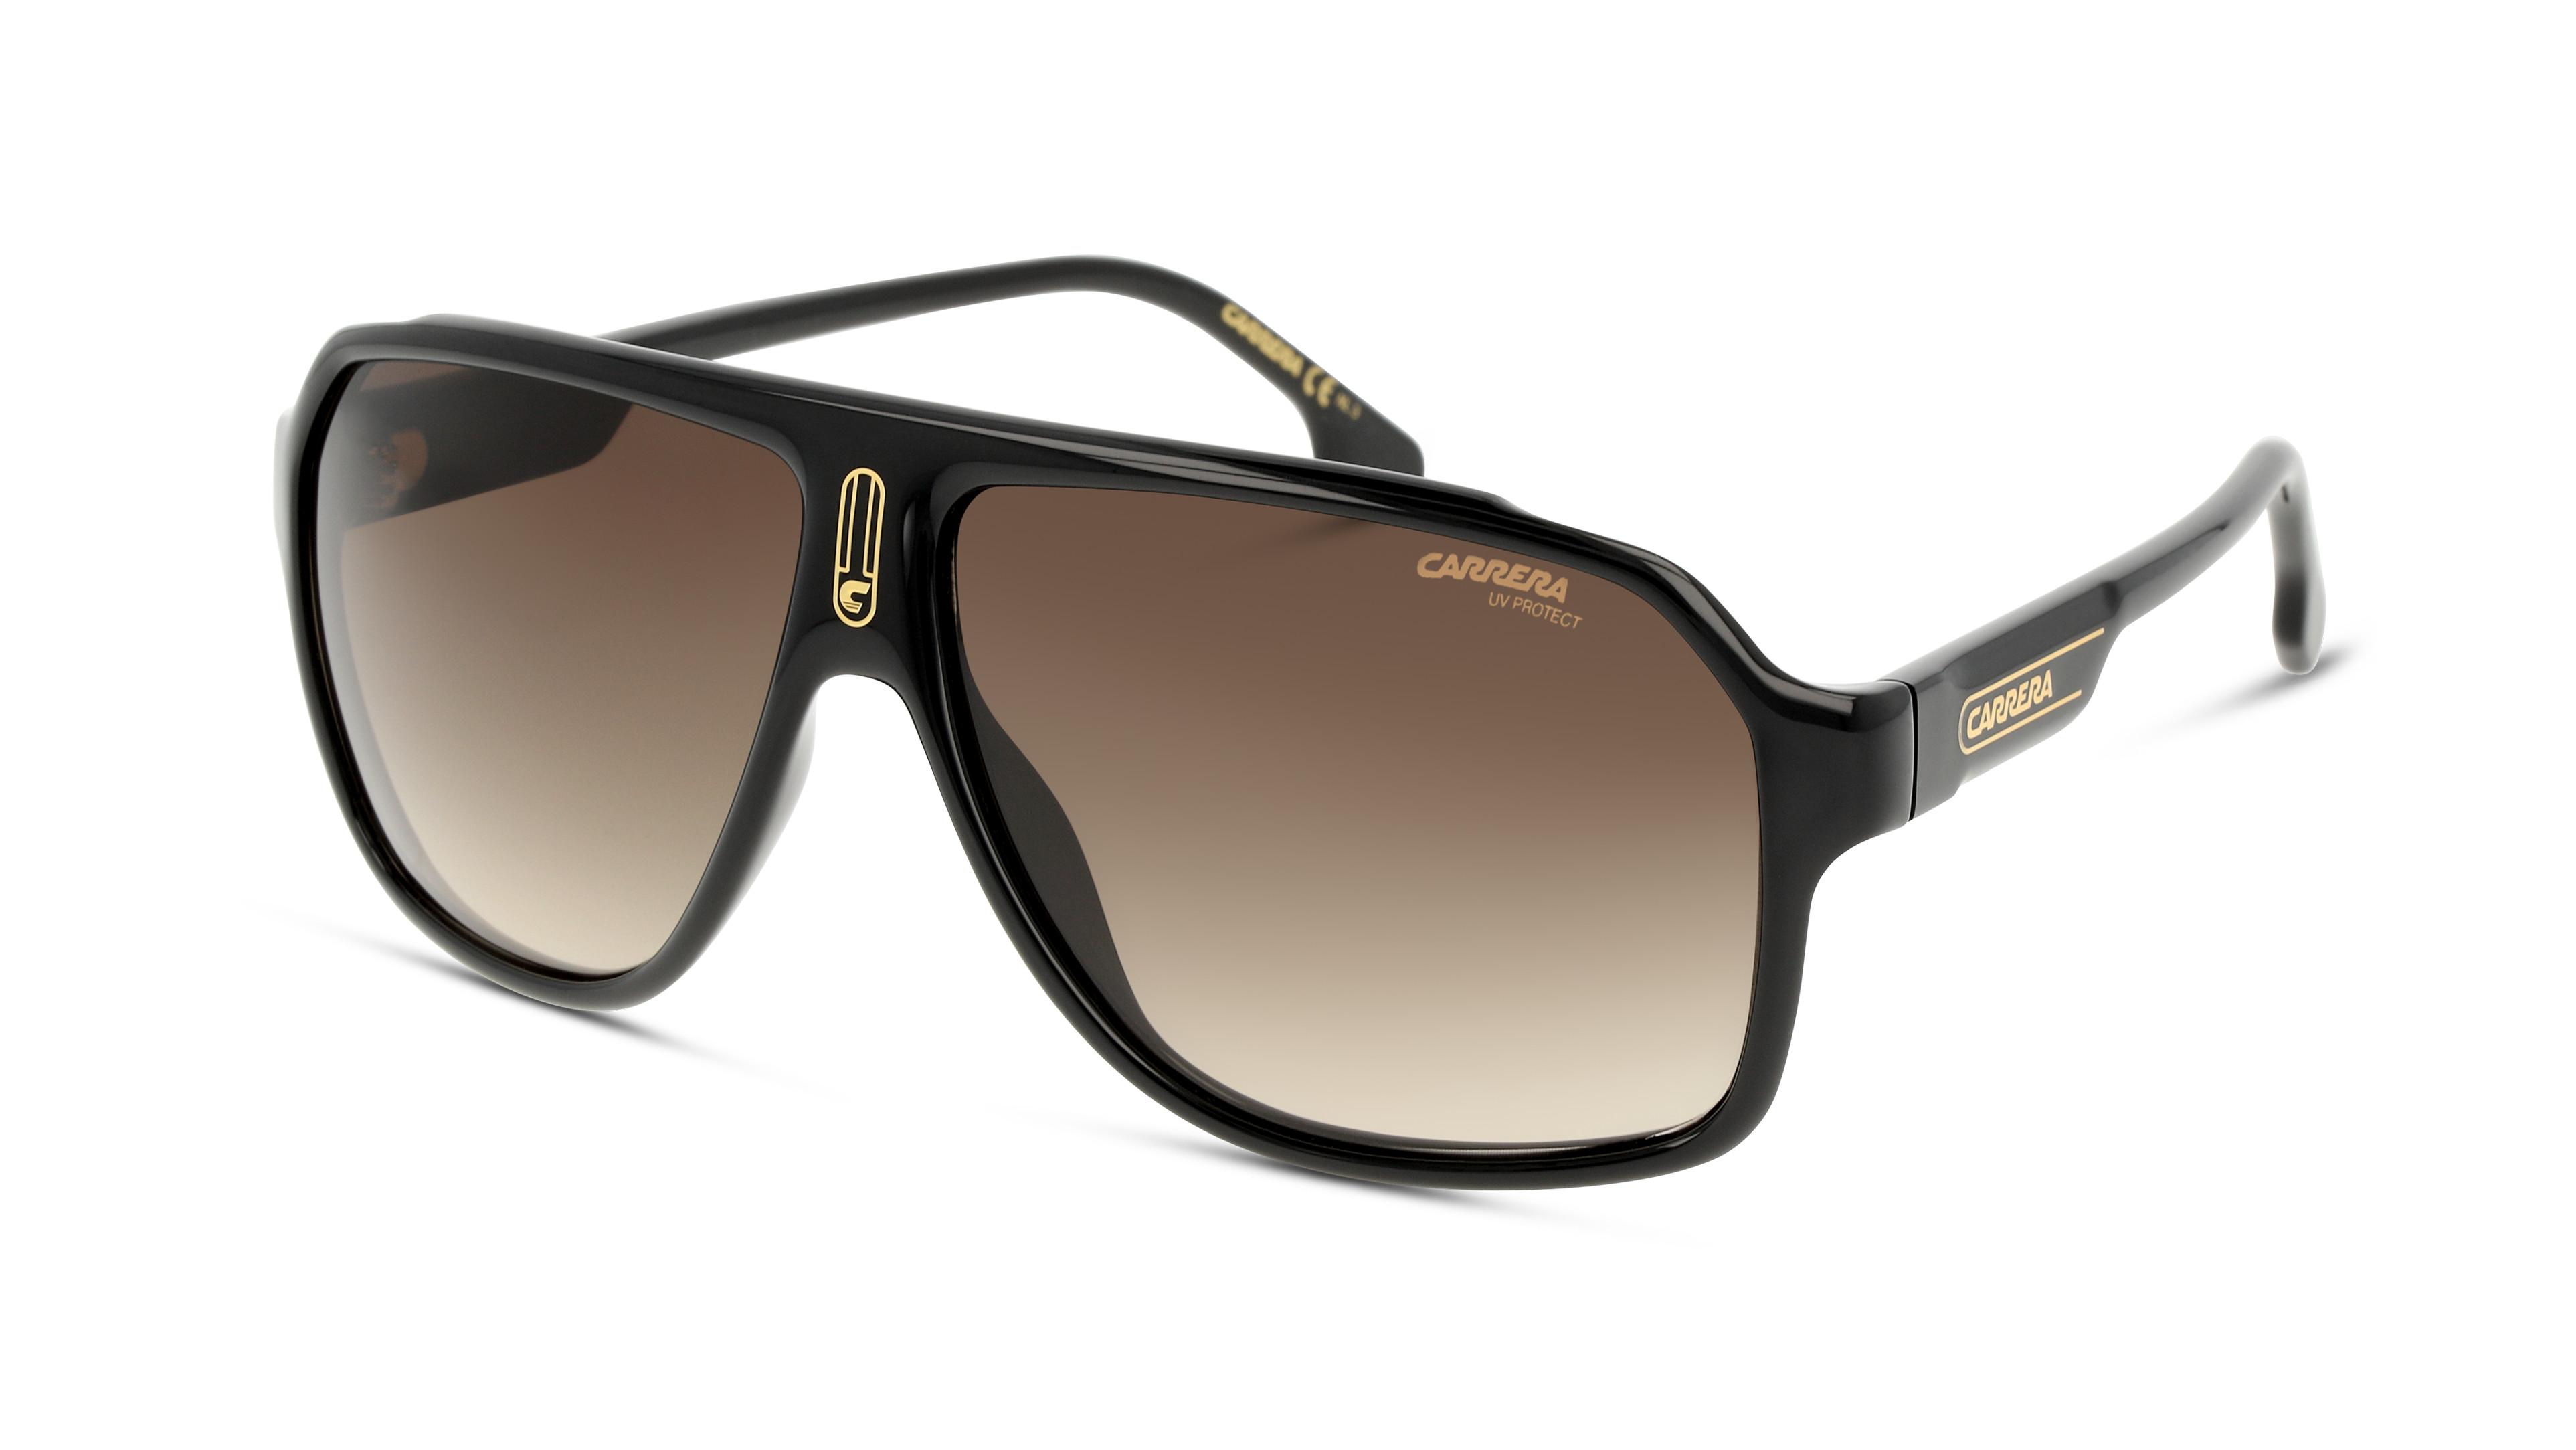 716736230030-angle-03-carrera-carrera_1030_s-eyewear-black